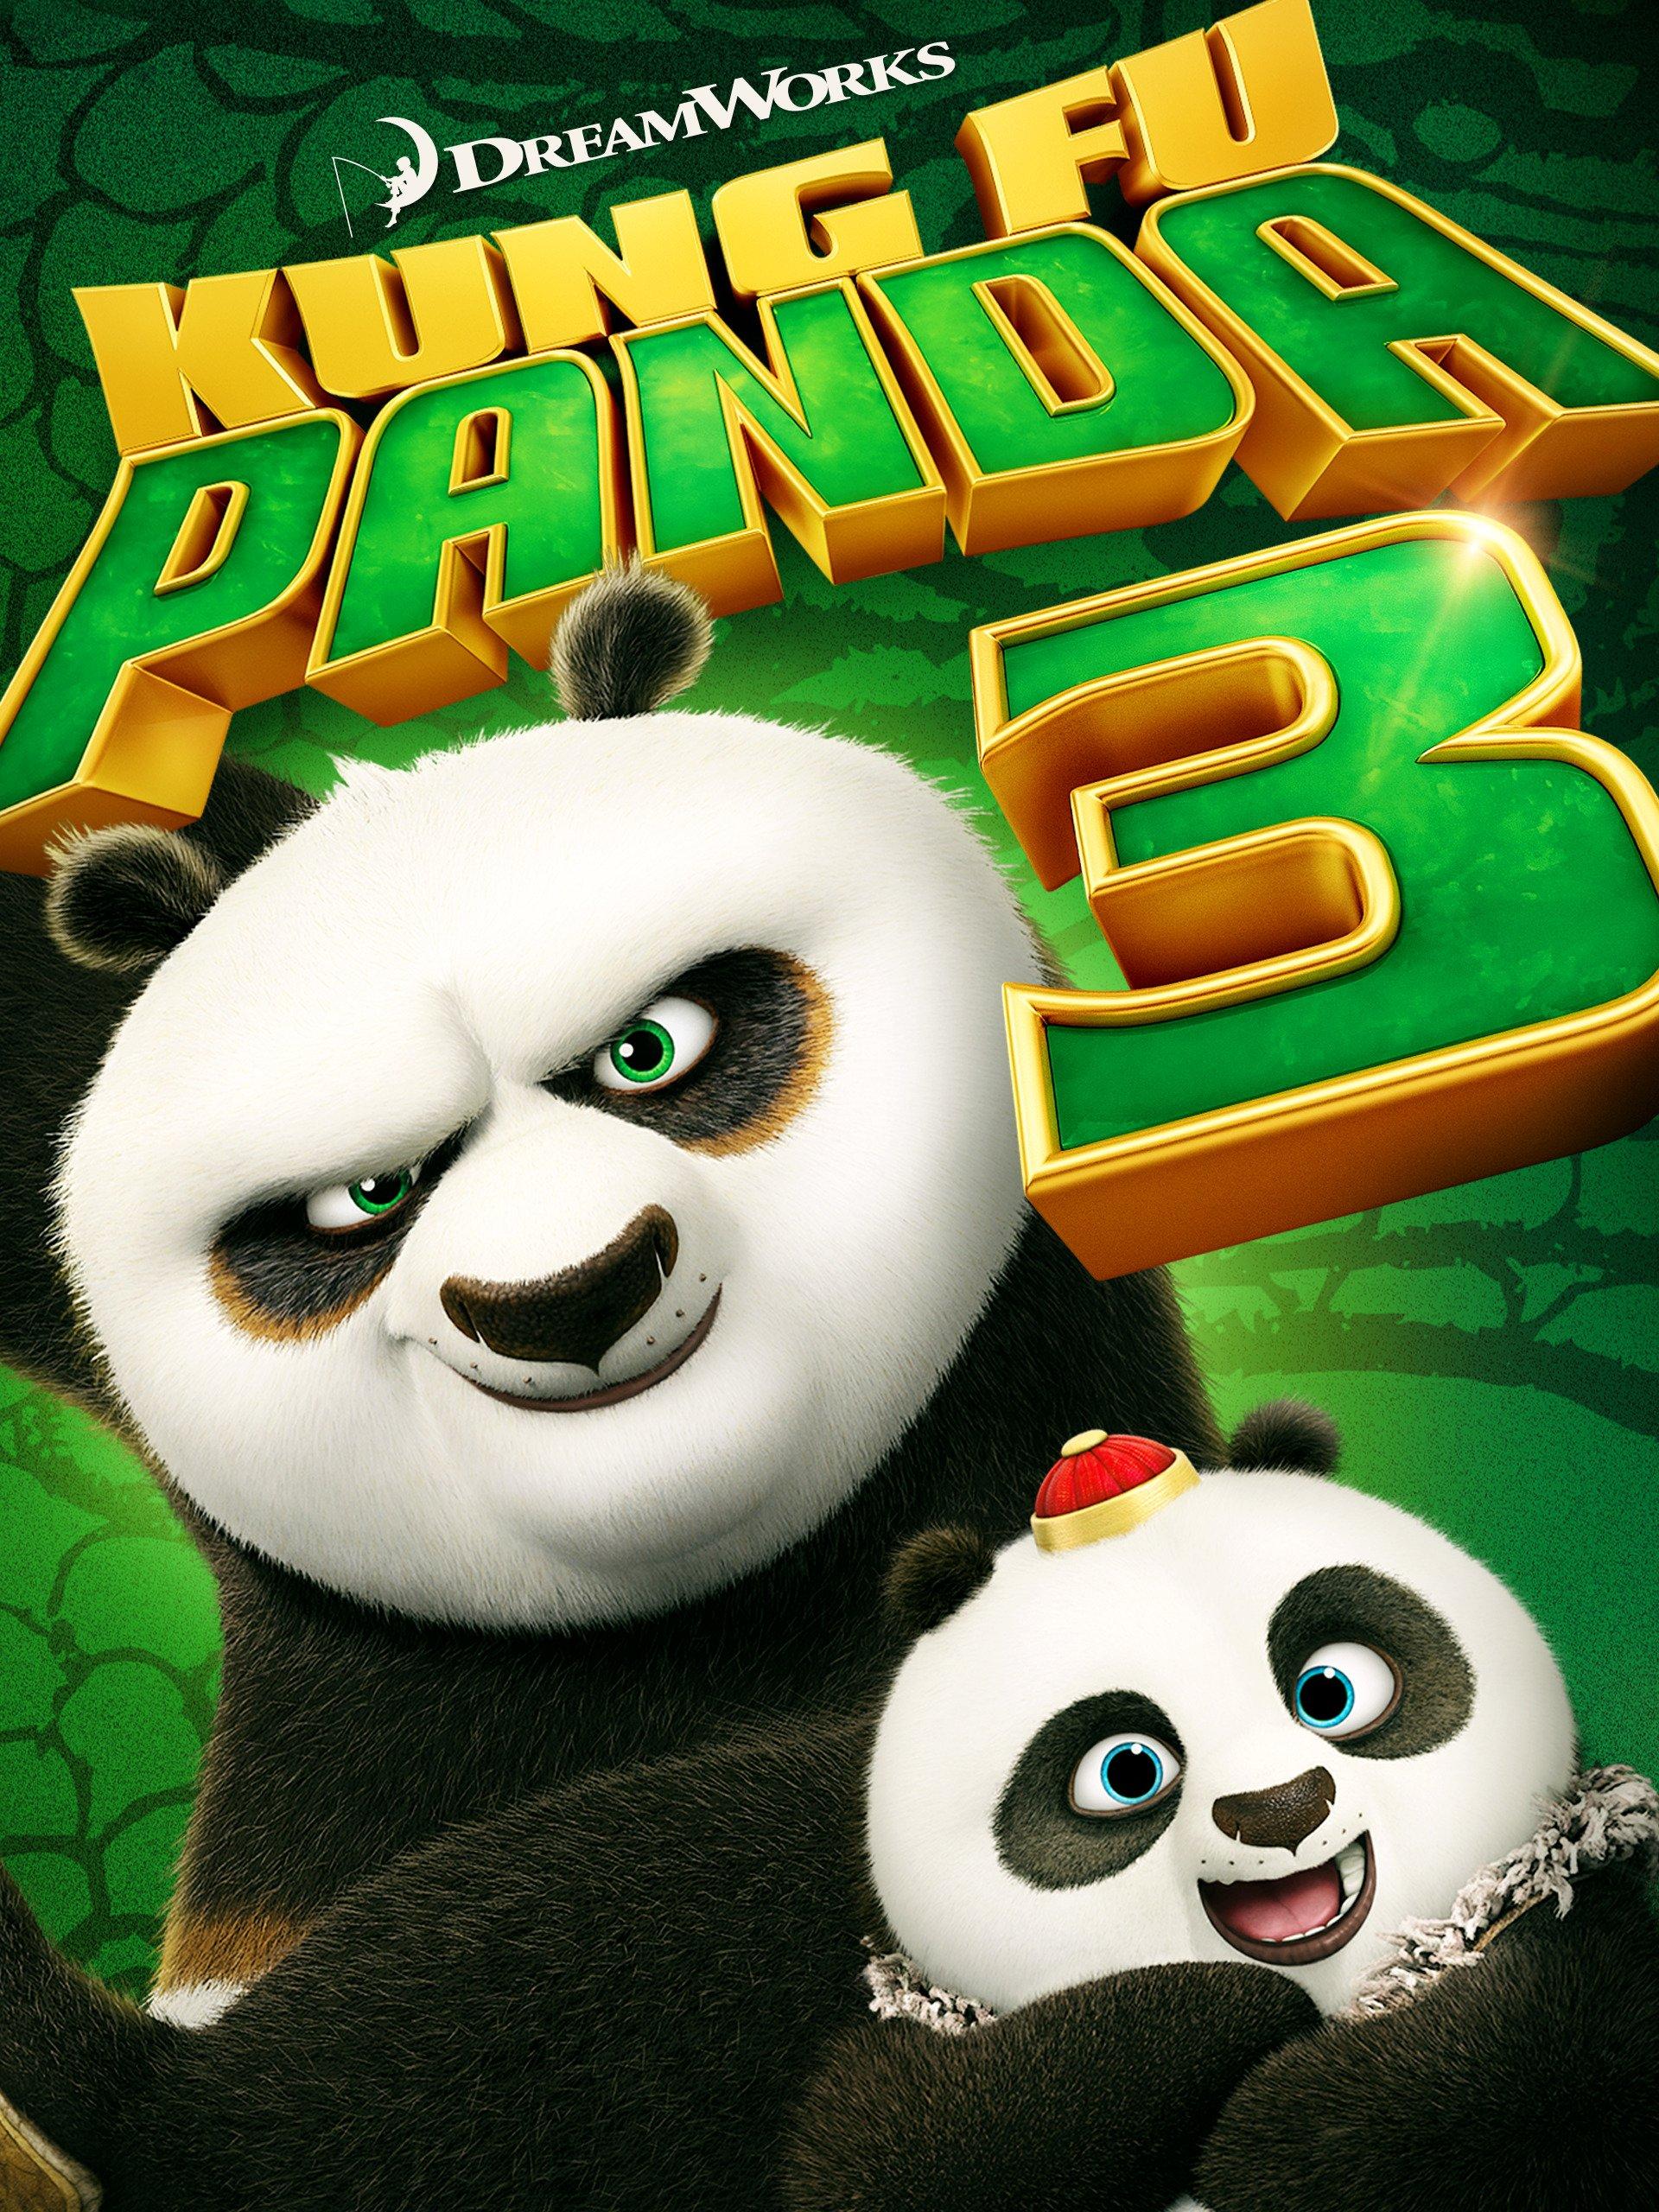 Kung Fu Panda 3 (2016) Bluray 720p Subtitle Indonesia